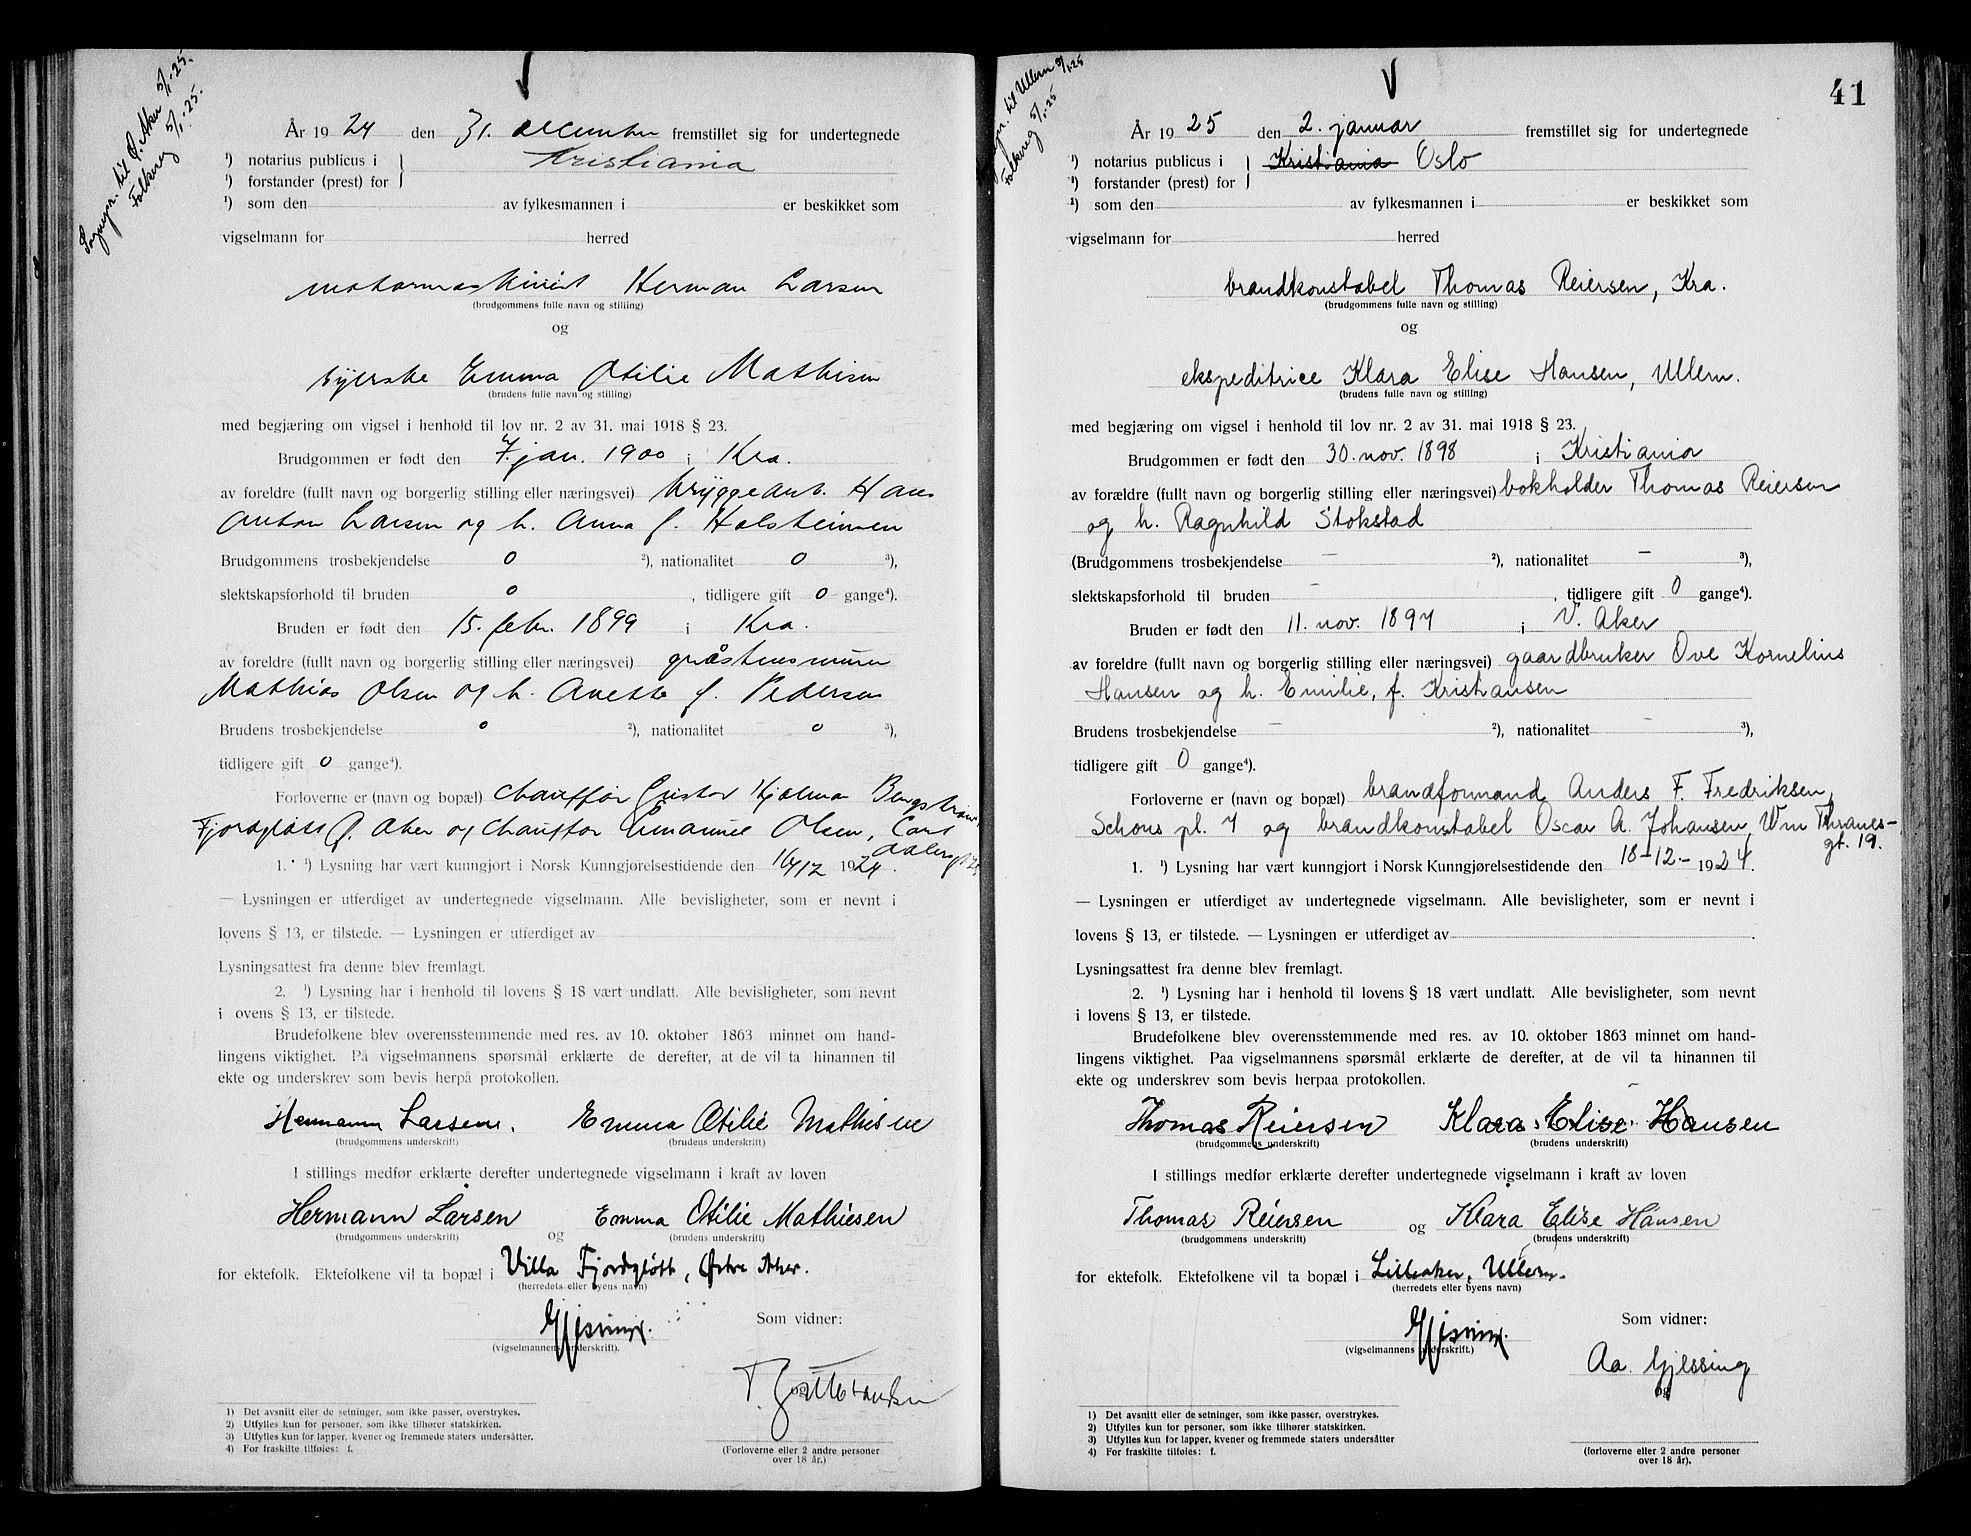 SAO, Oslo byfogd avd. I, L/Lb/Lbb/L0017: Notarialprotokoll, rekke II: Vigsler, 1924-1926, s. 40b-41a